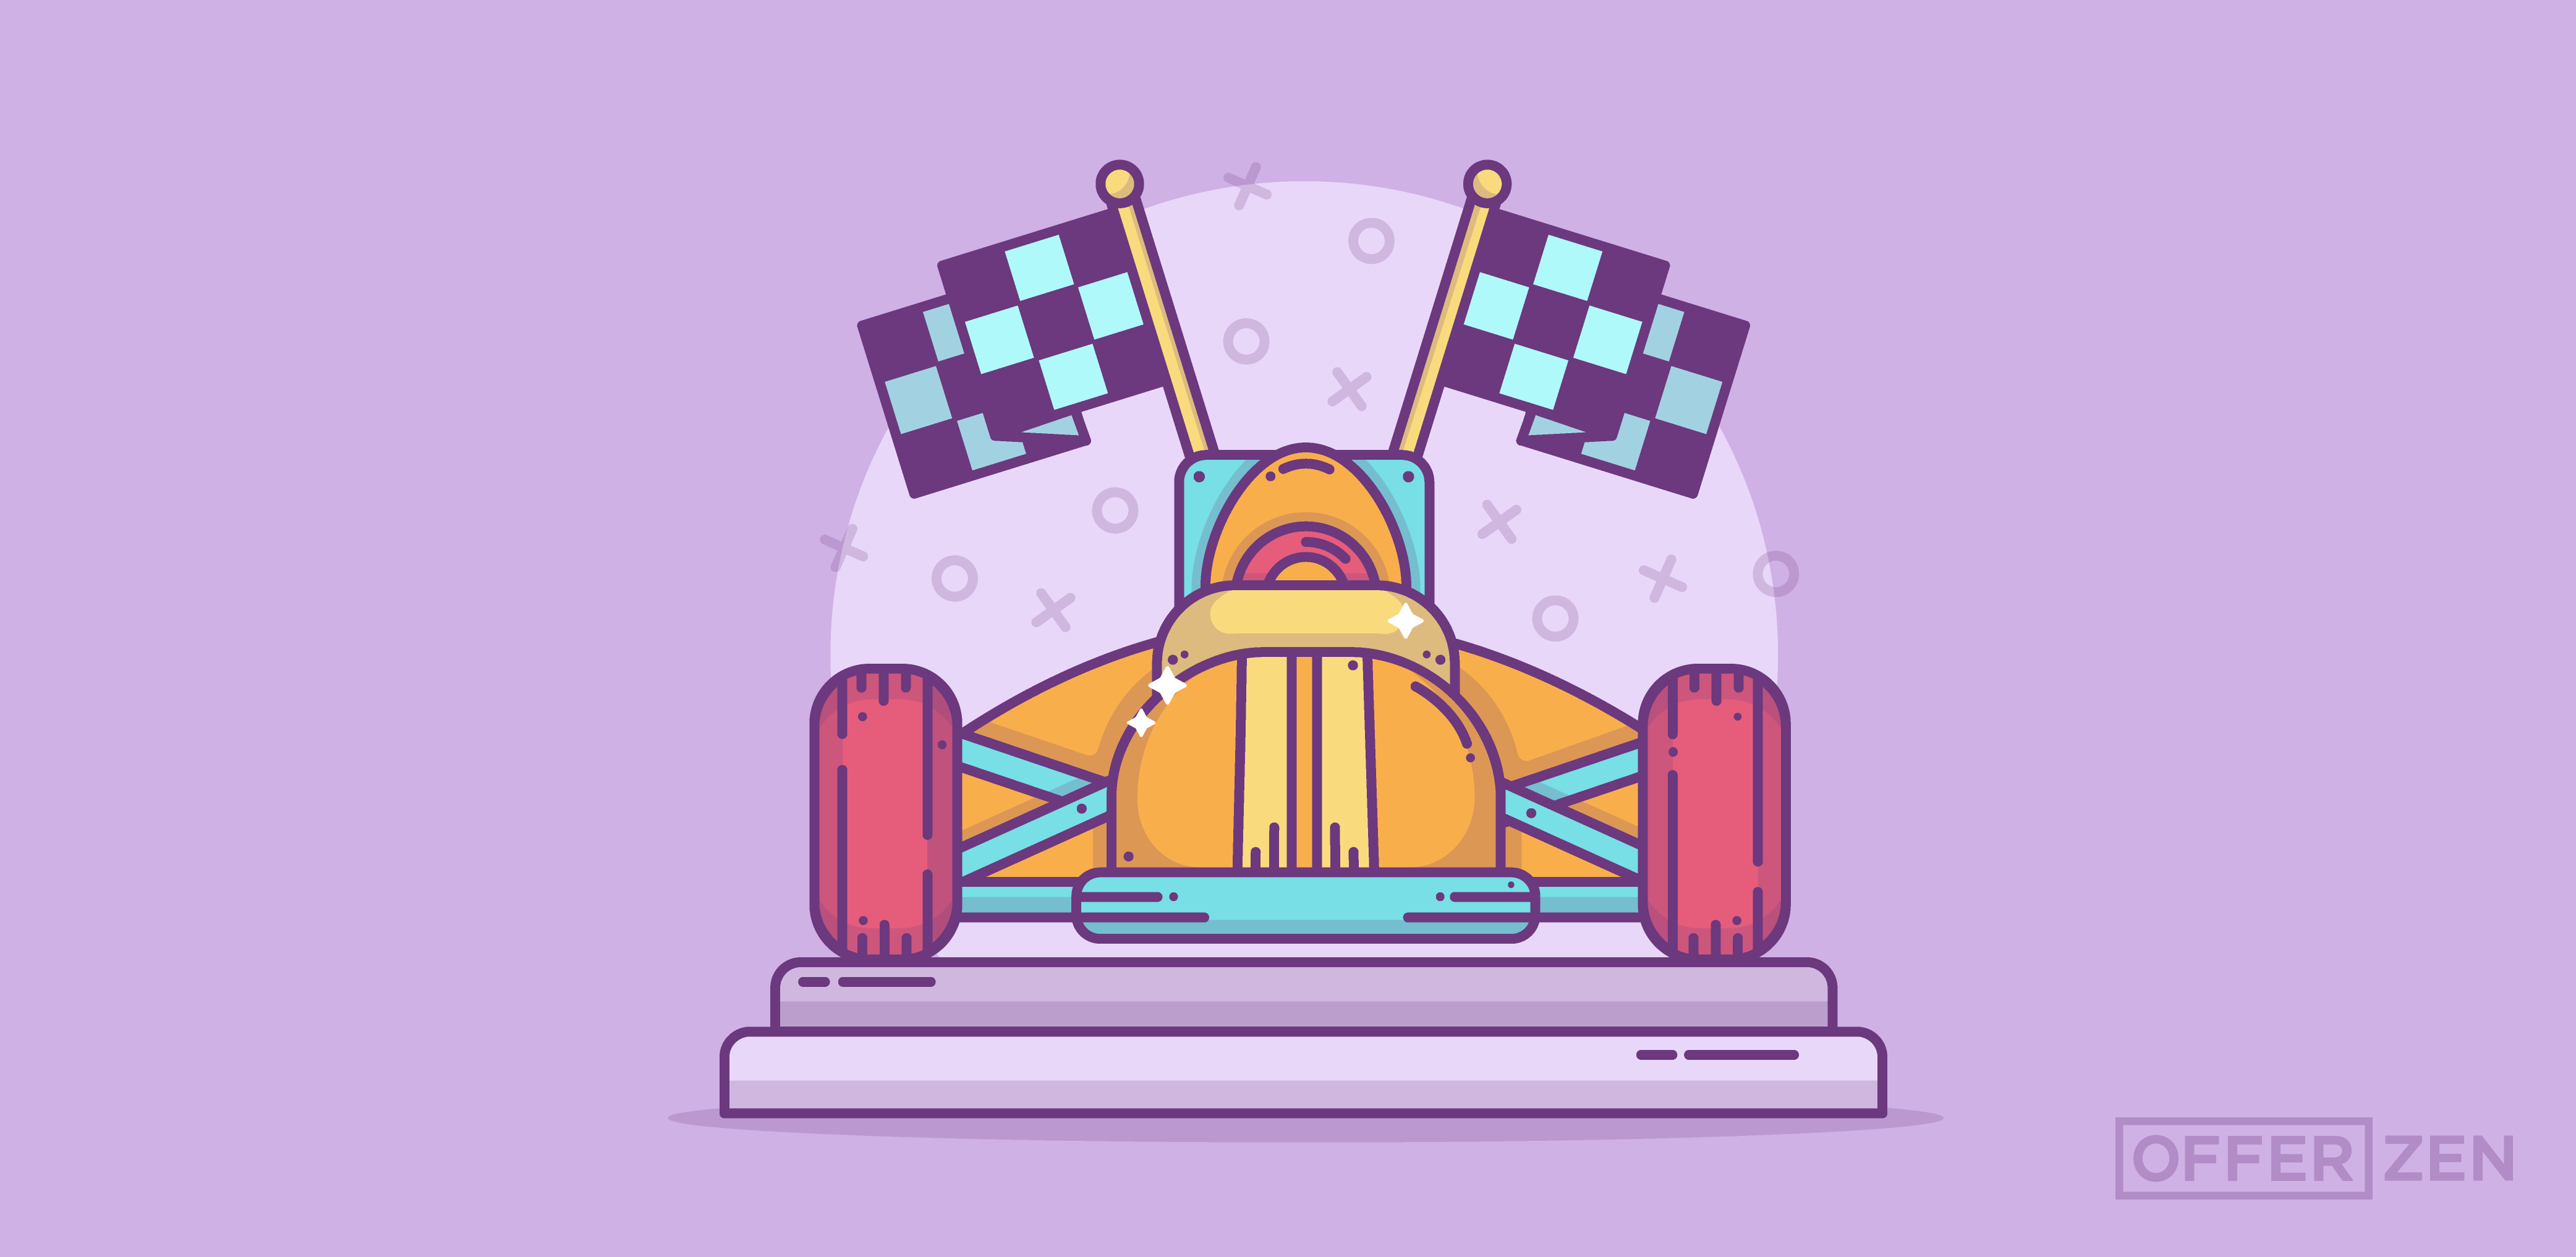 Craig_racecar-front_Sedan-to-Supercar---Test-Always--Part-3-_inner-article-image